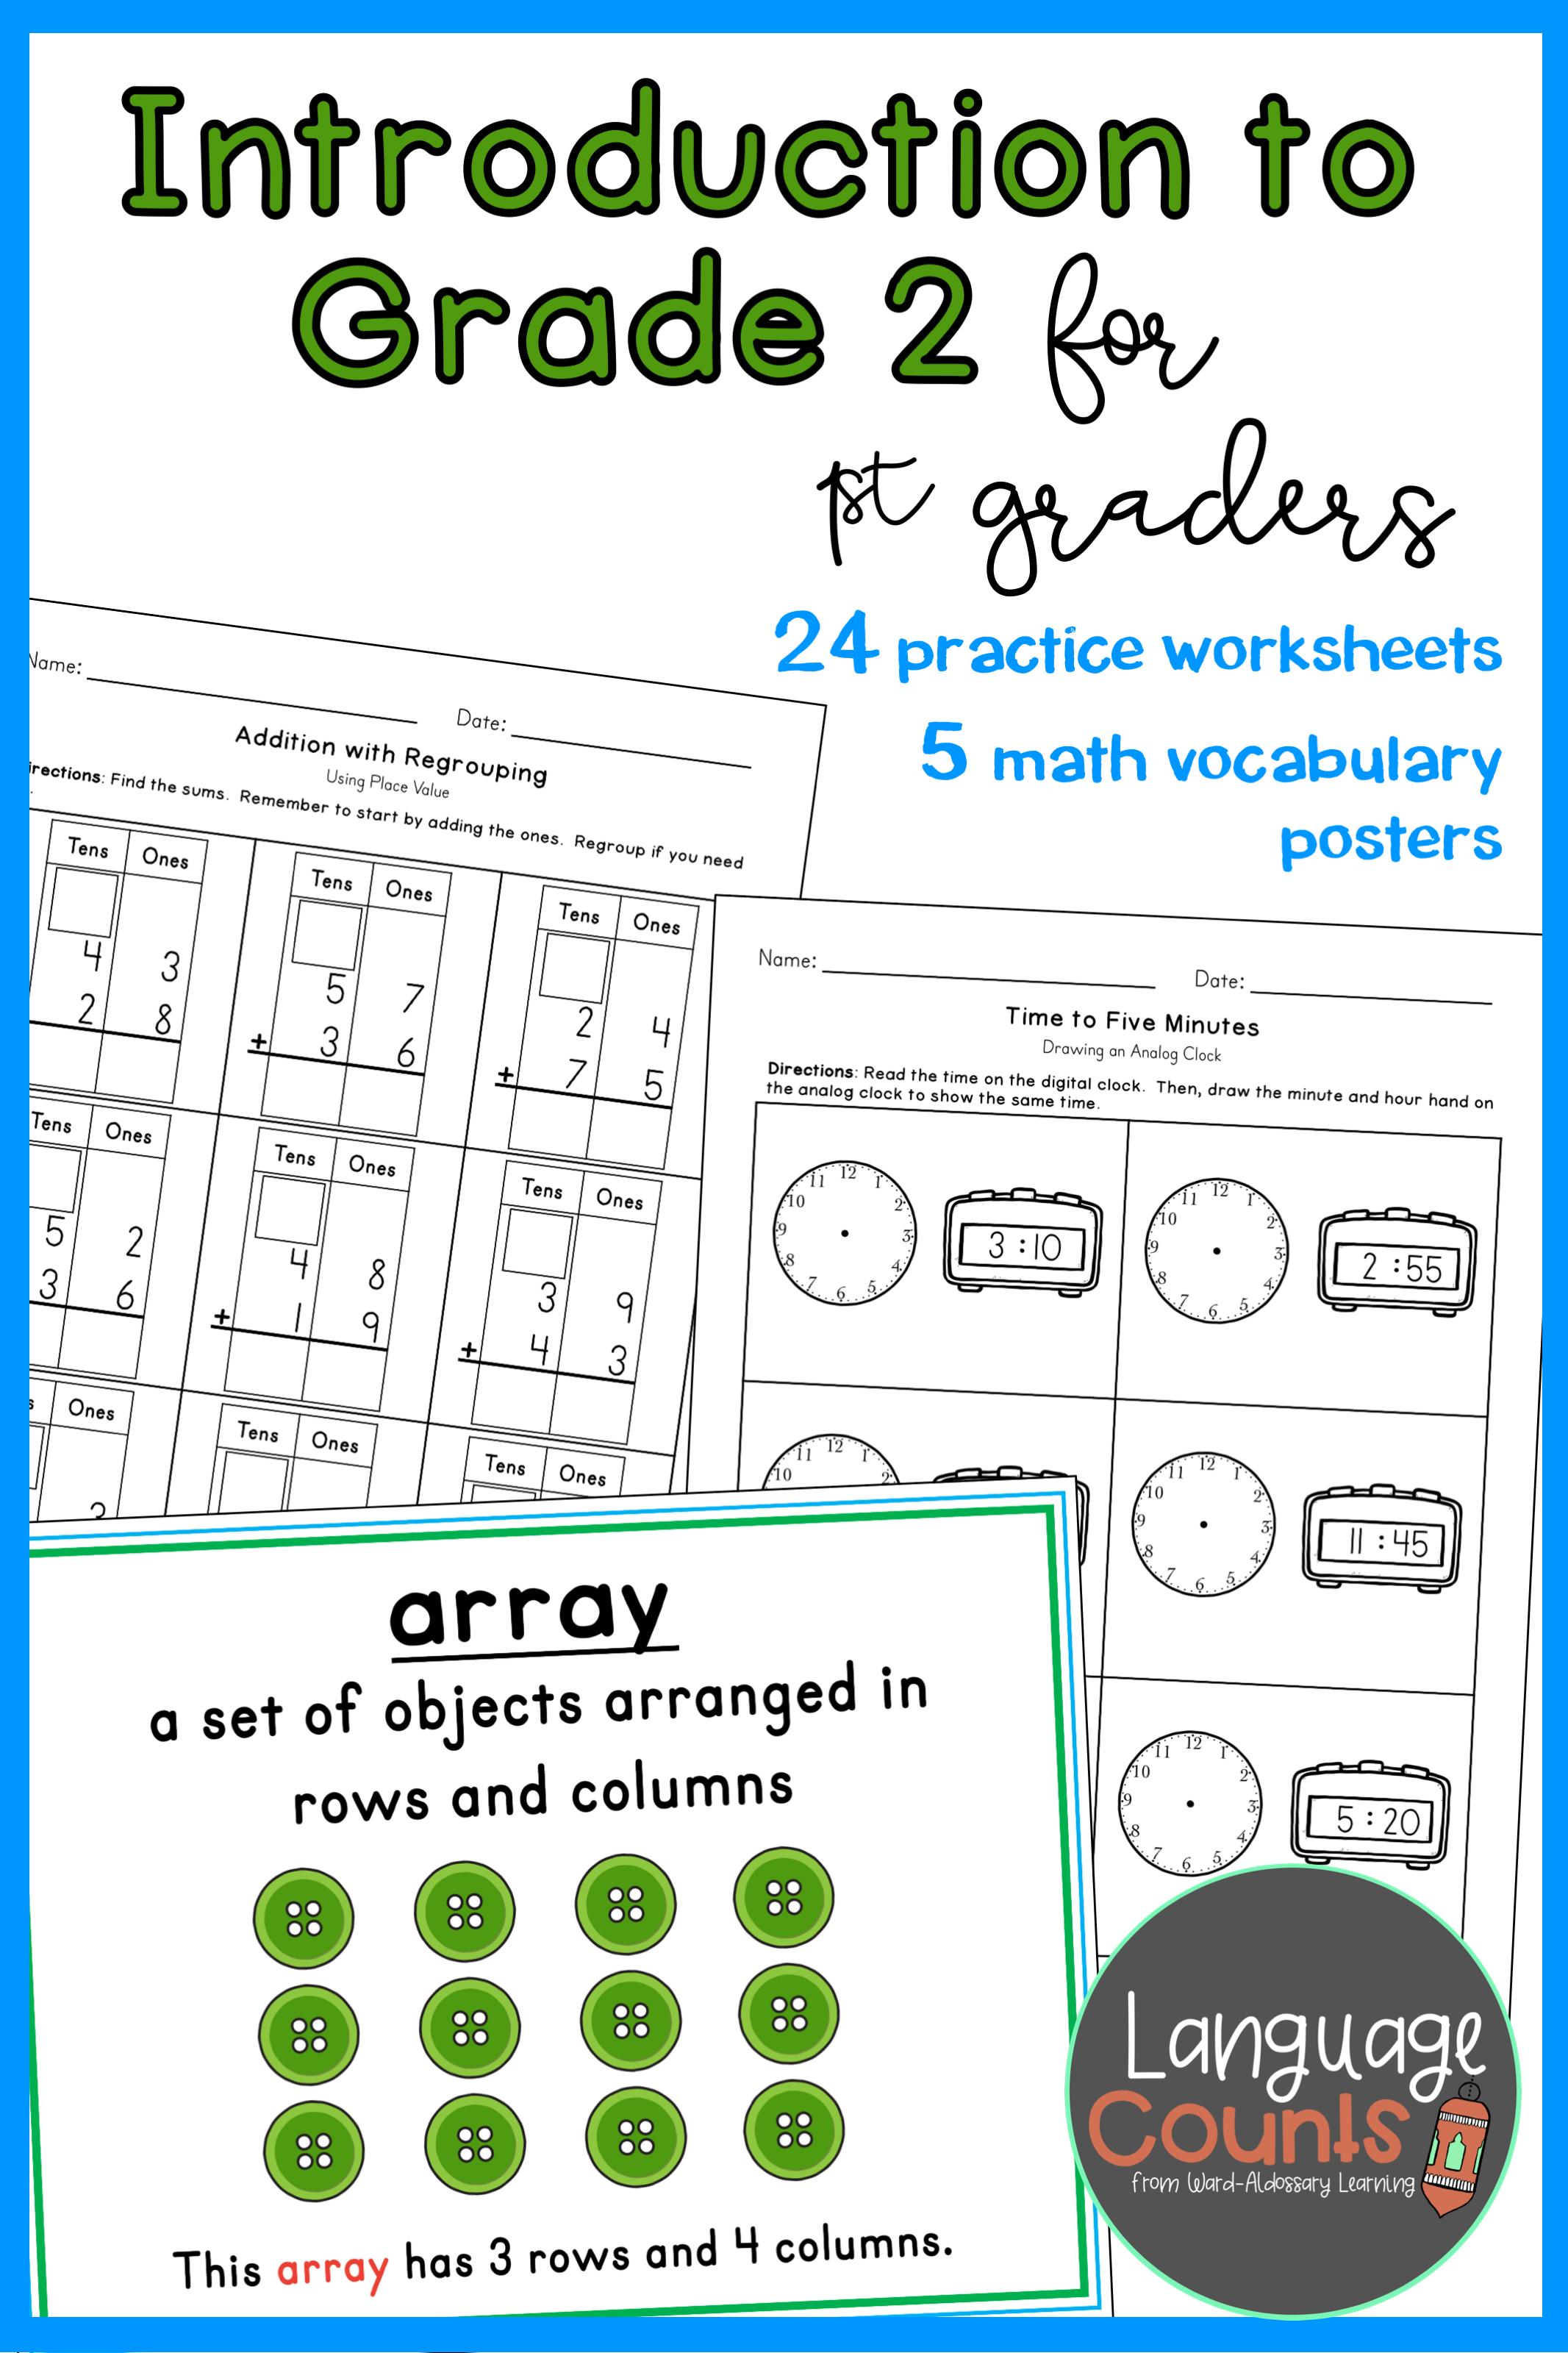 medium resolution of Introduction to Grade 2 Topics- 1st Grade   Elementary school math